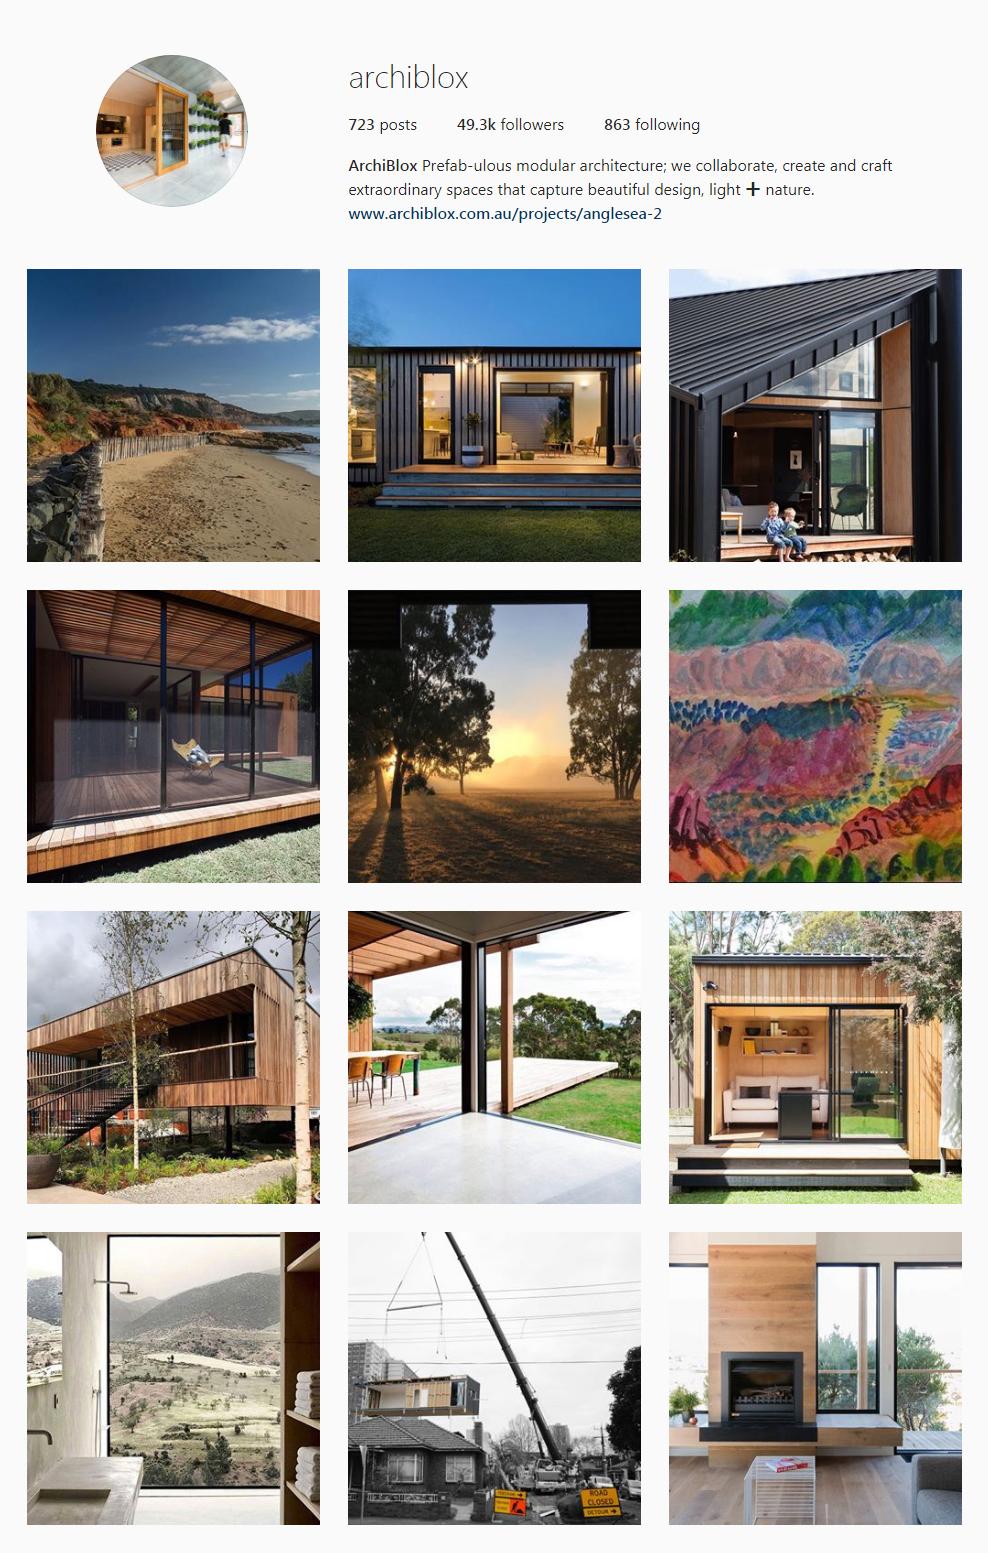 Best Architectural Instagram Feeds of 2017 - archiblox